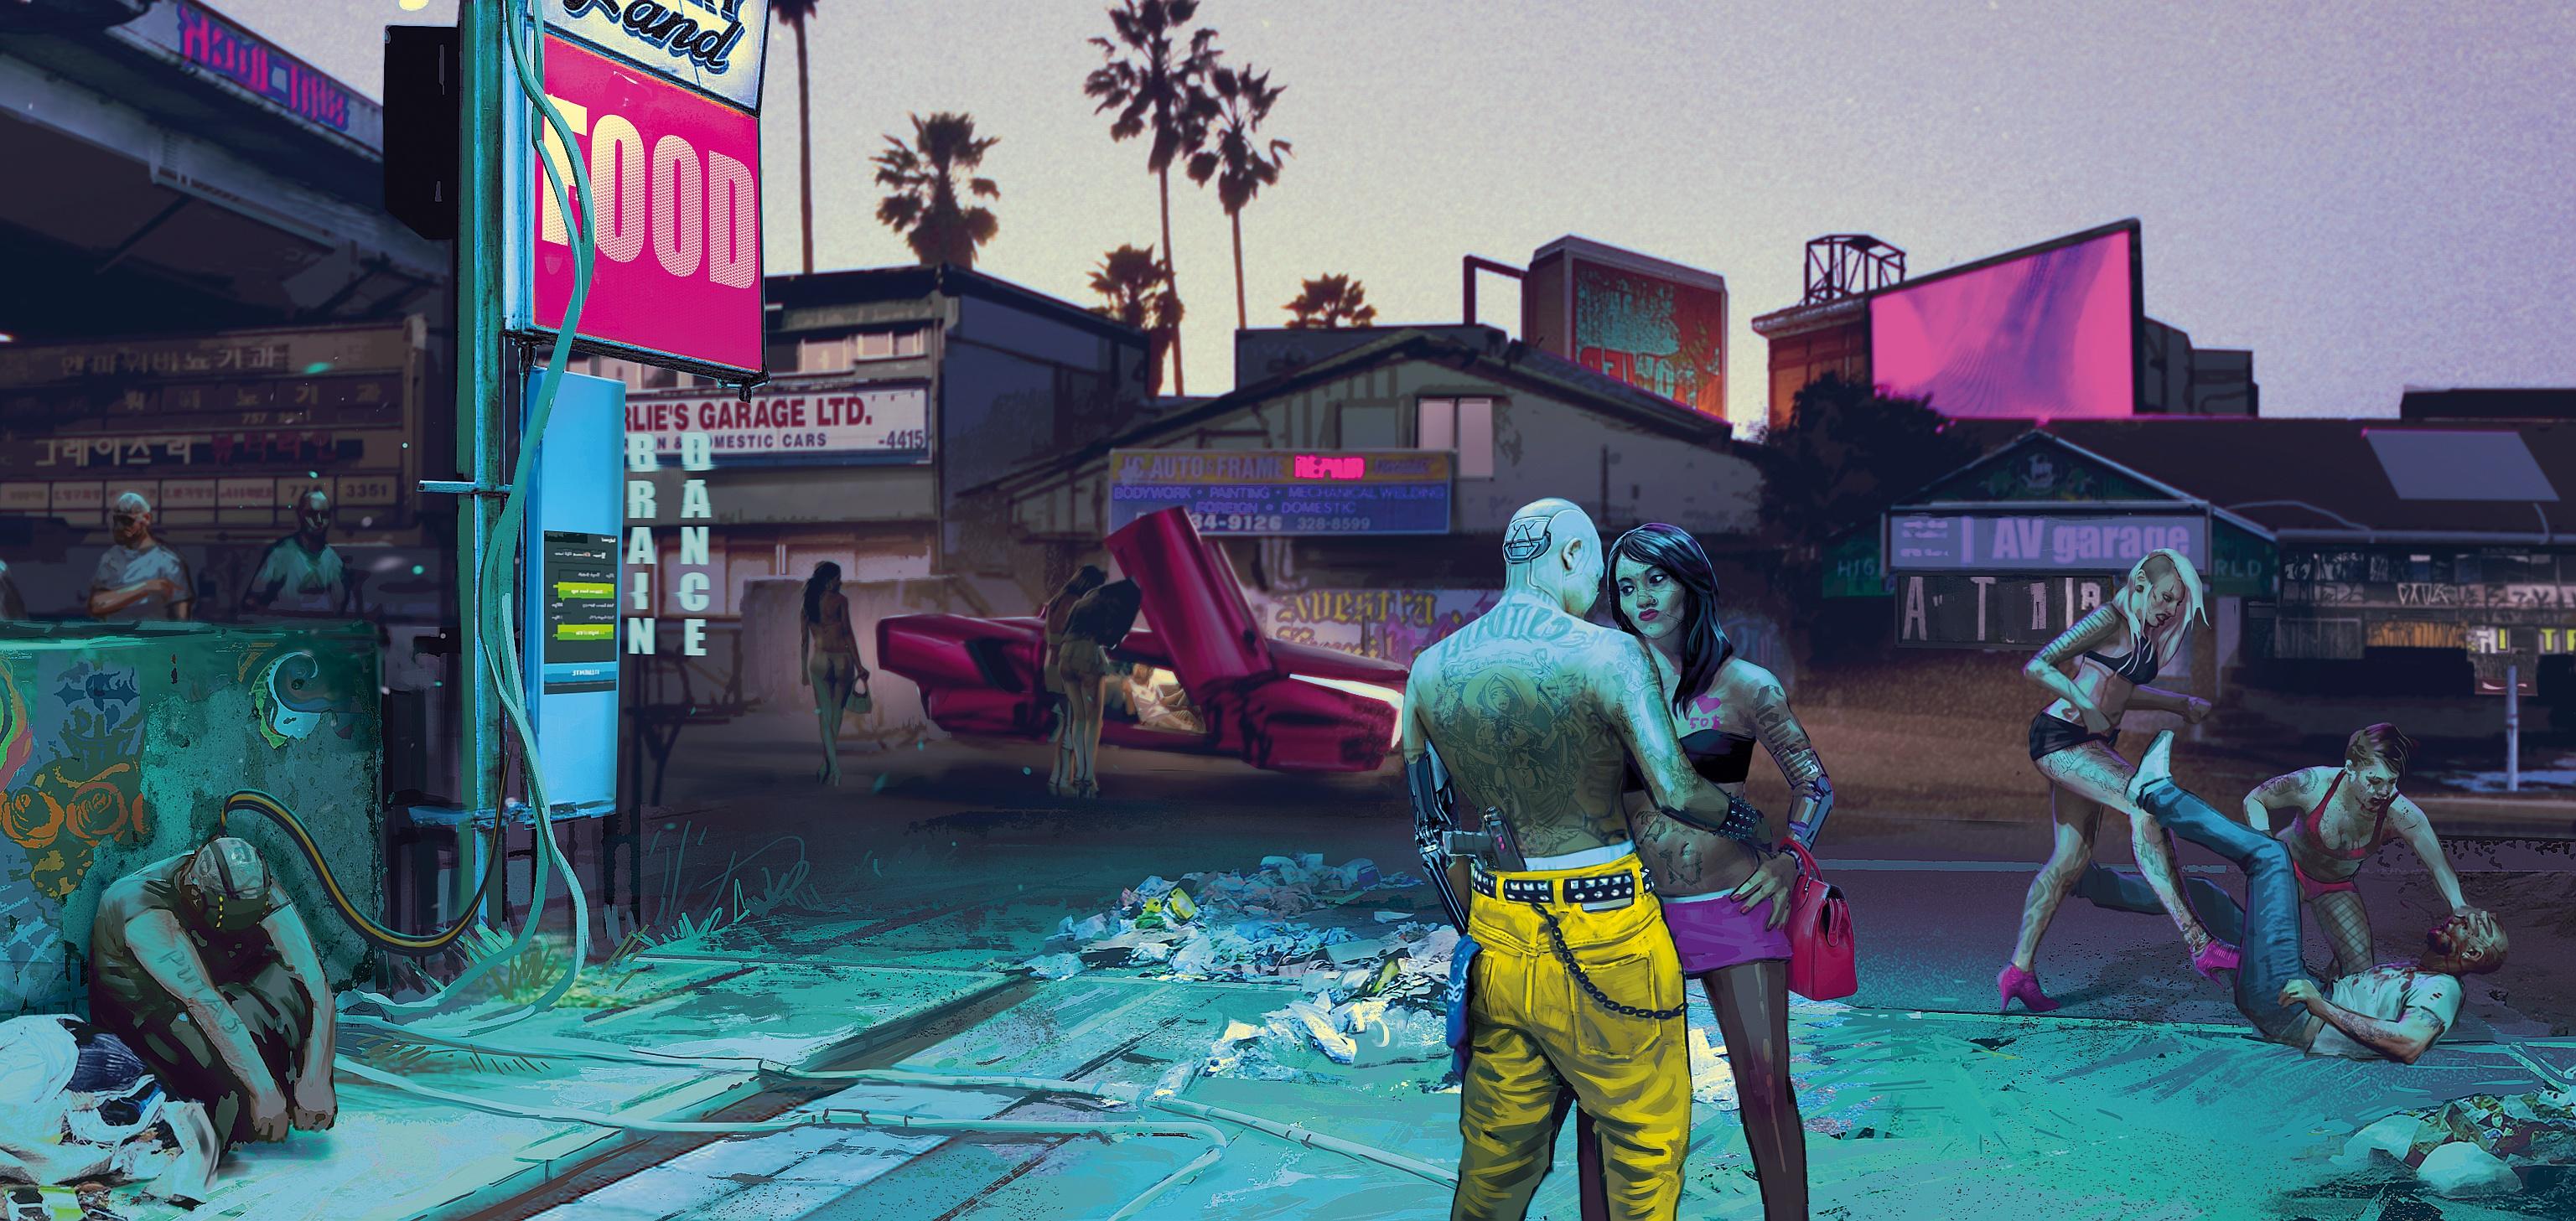 231451-Cyberpunk2077_Street_Life_RGB.jpg